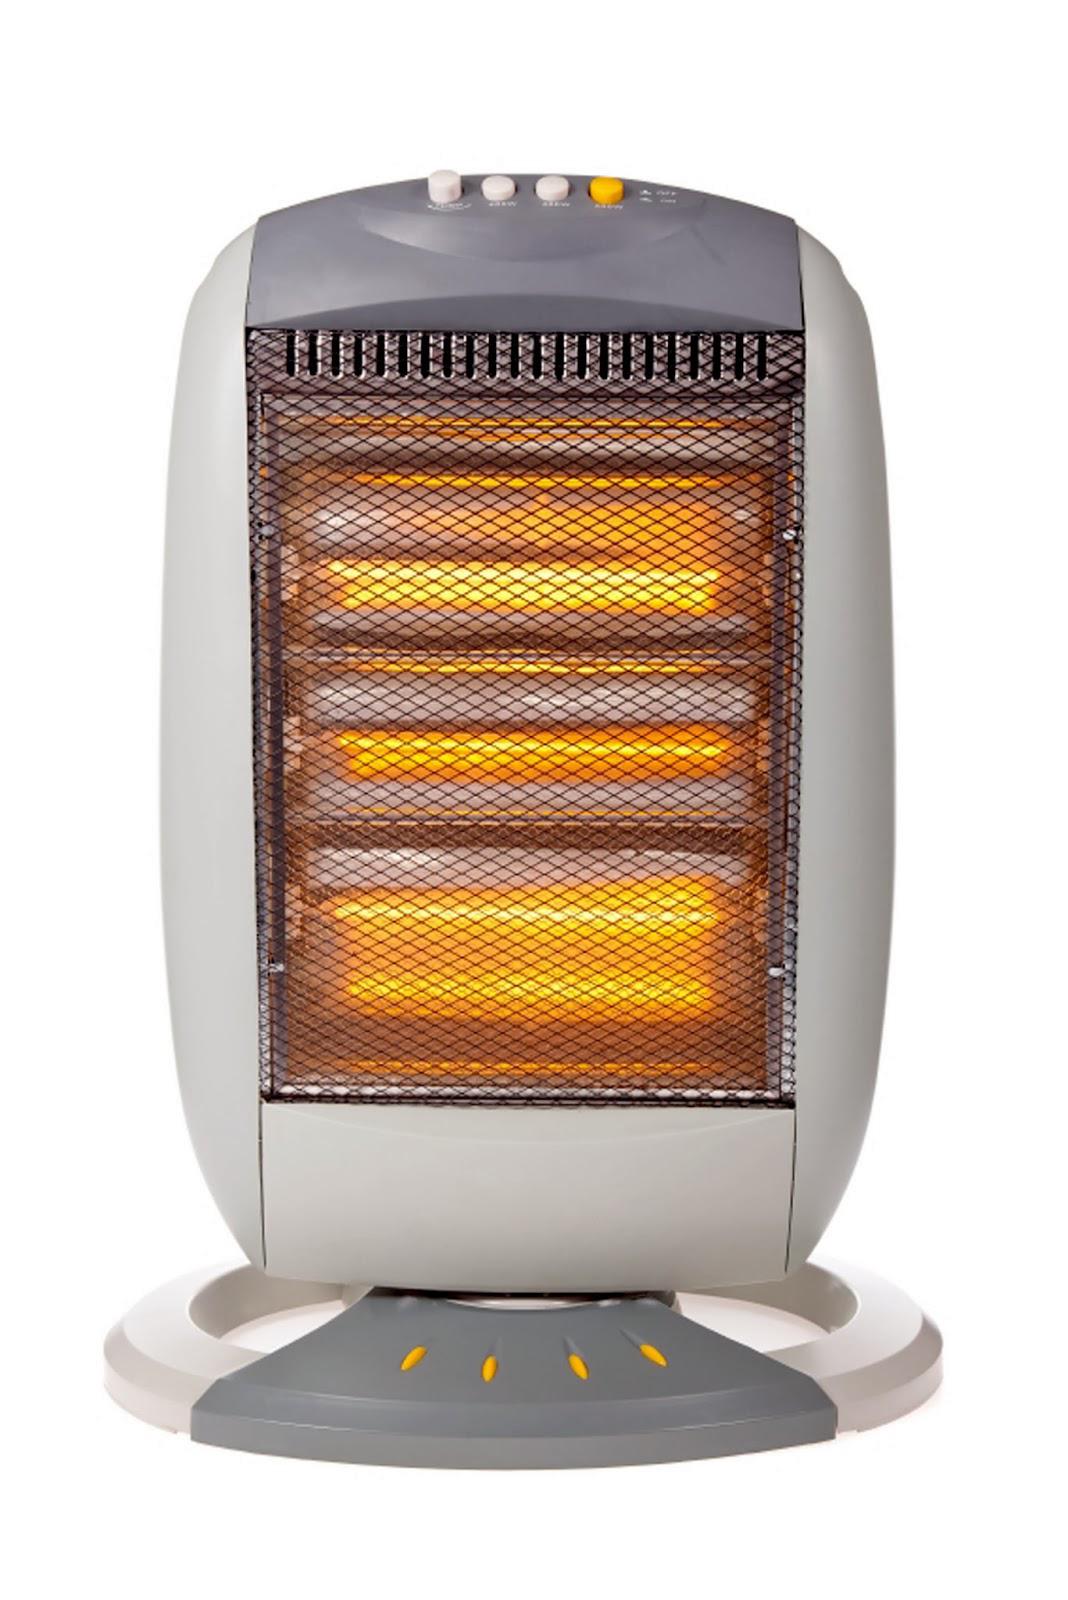 Menu clipart heating. Heater png mart